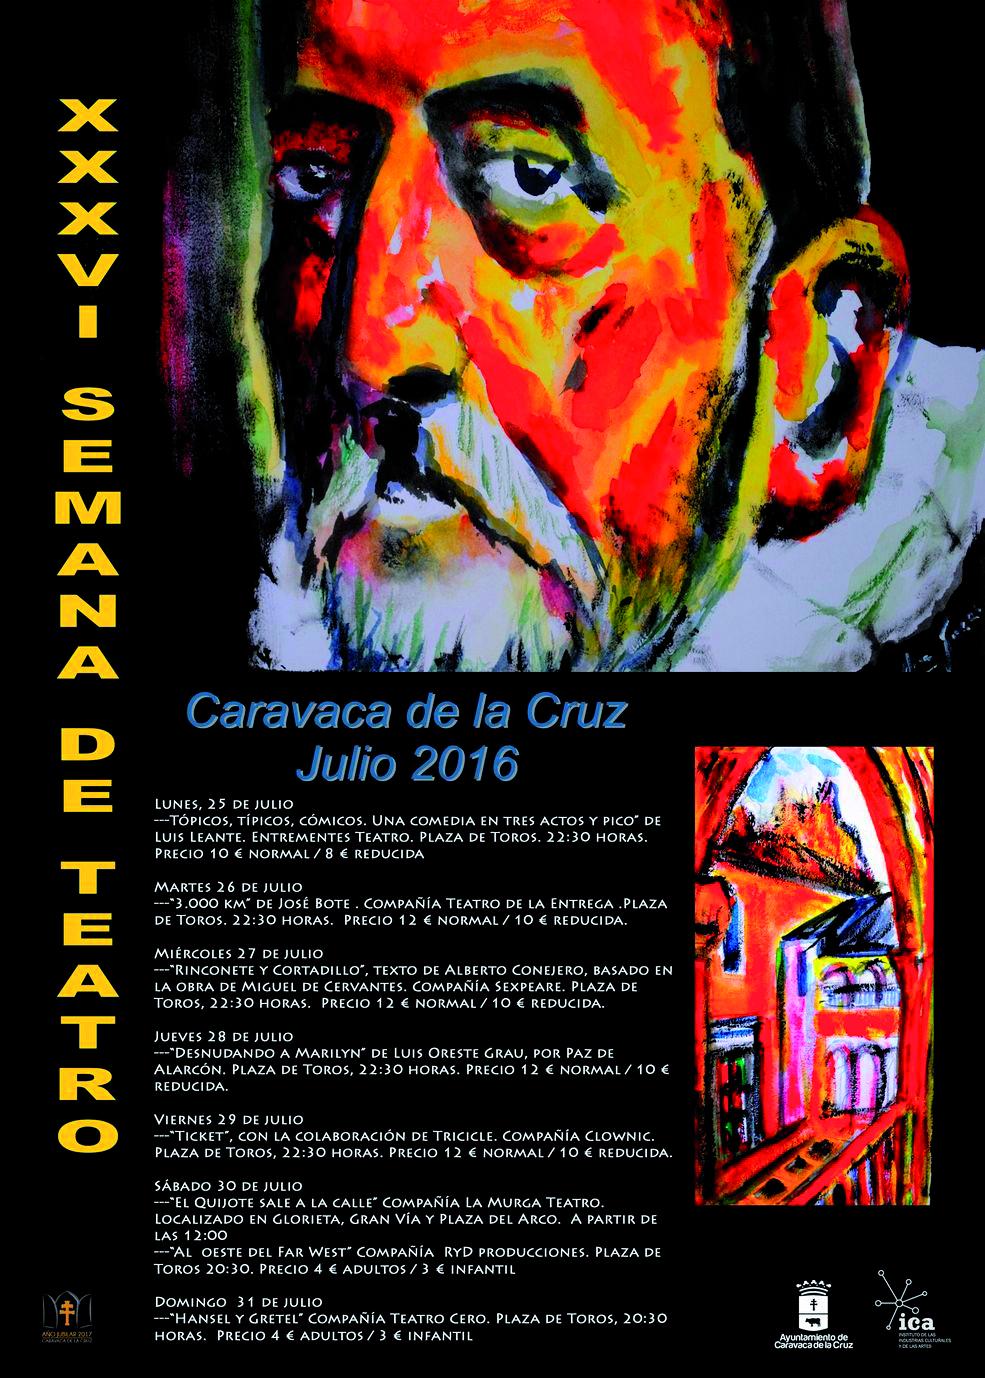 La Semana de Teatro en Caravaca de la Cruz